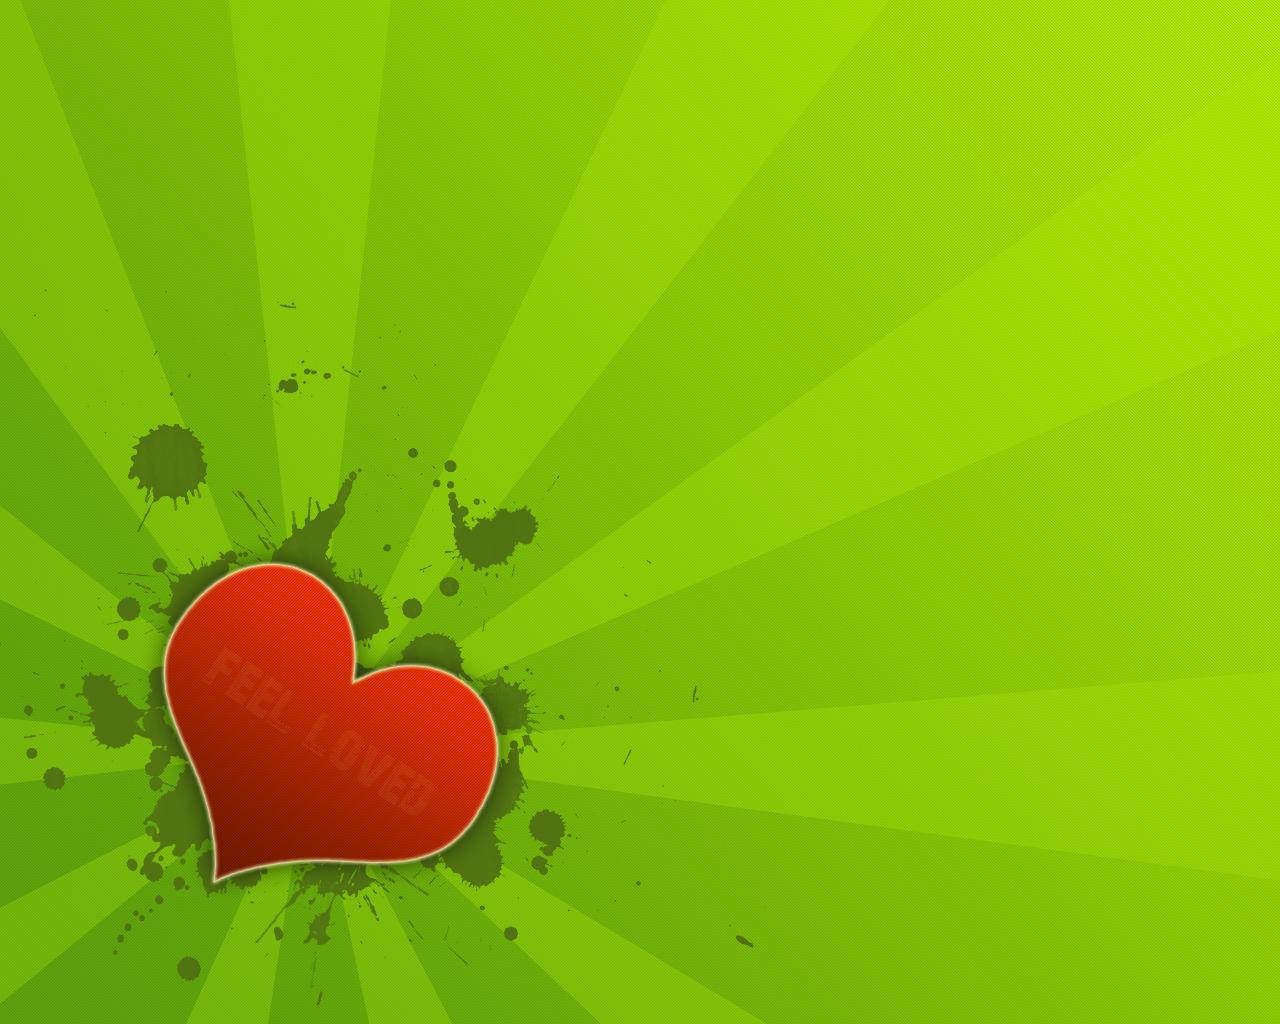 Simple Wallpaper Love Green - The-best-top-love-desktop-wallpapers-17  Picture_6474100.jpg